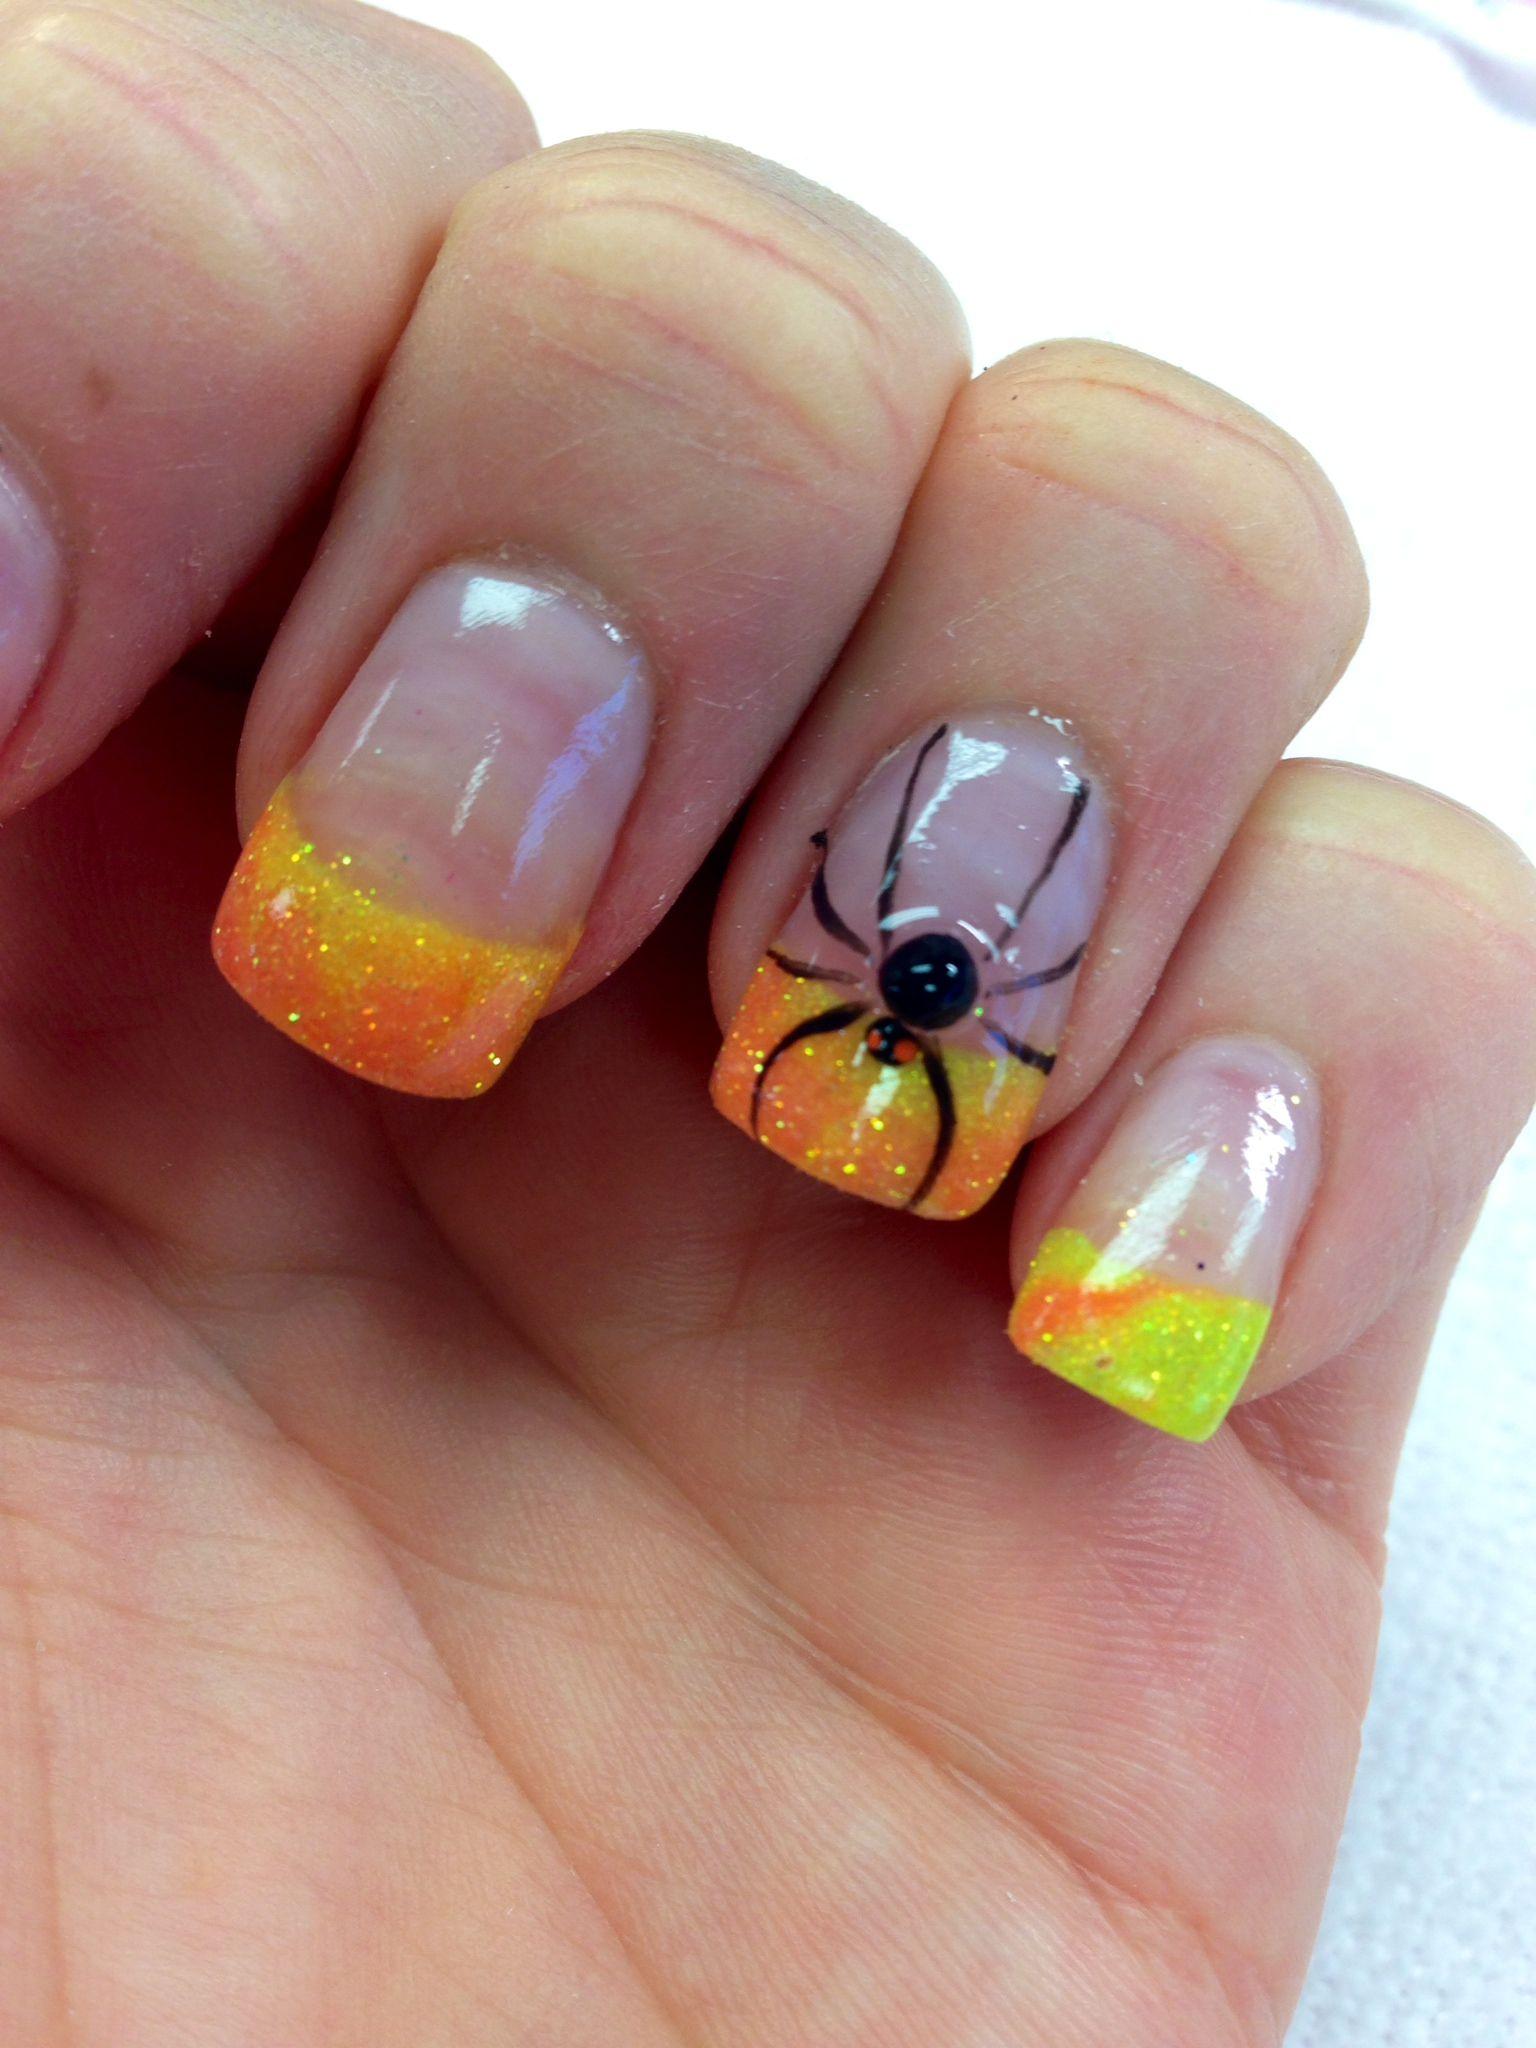 My acrylic nails, nail art, Halloween, fall, 3-D art, colored ...